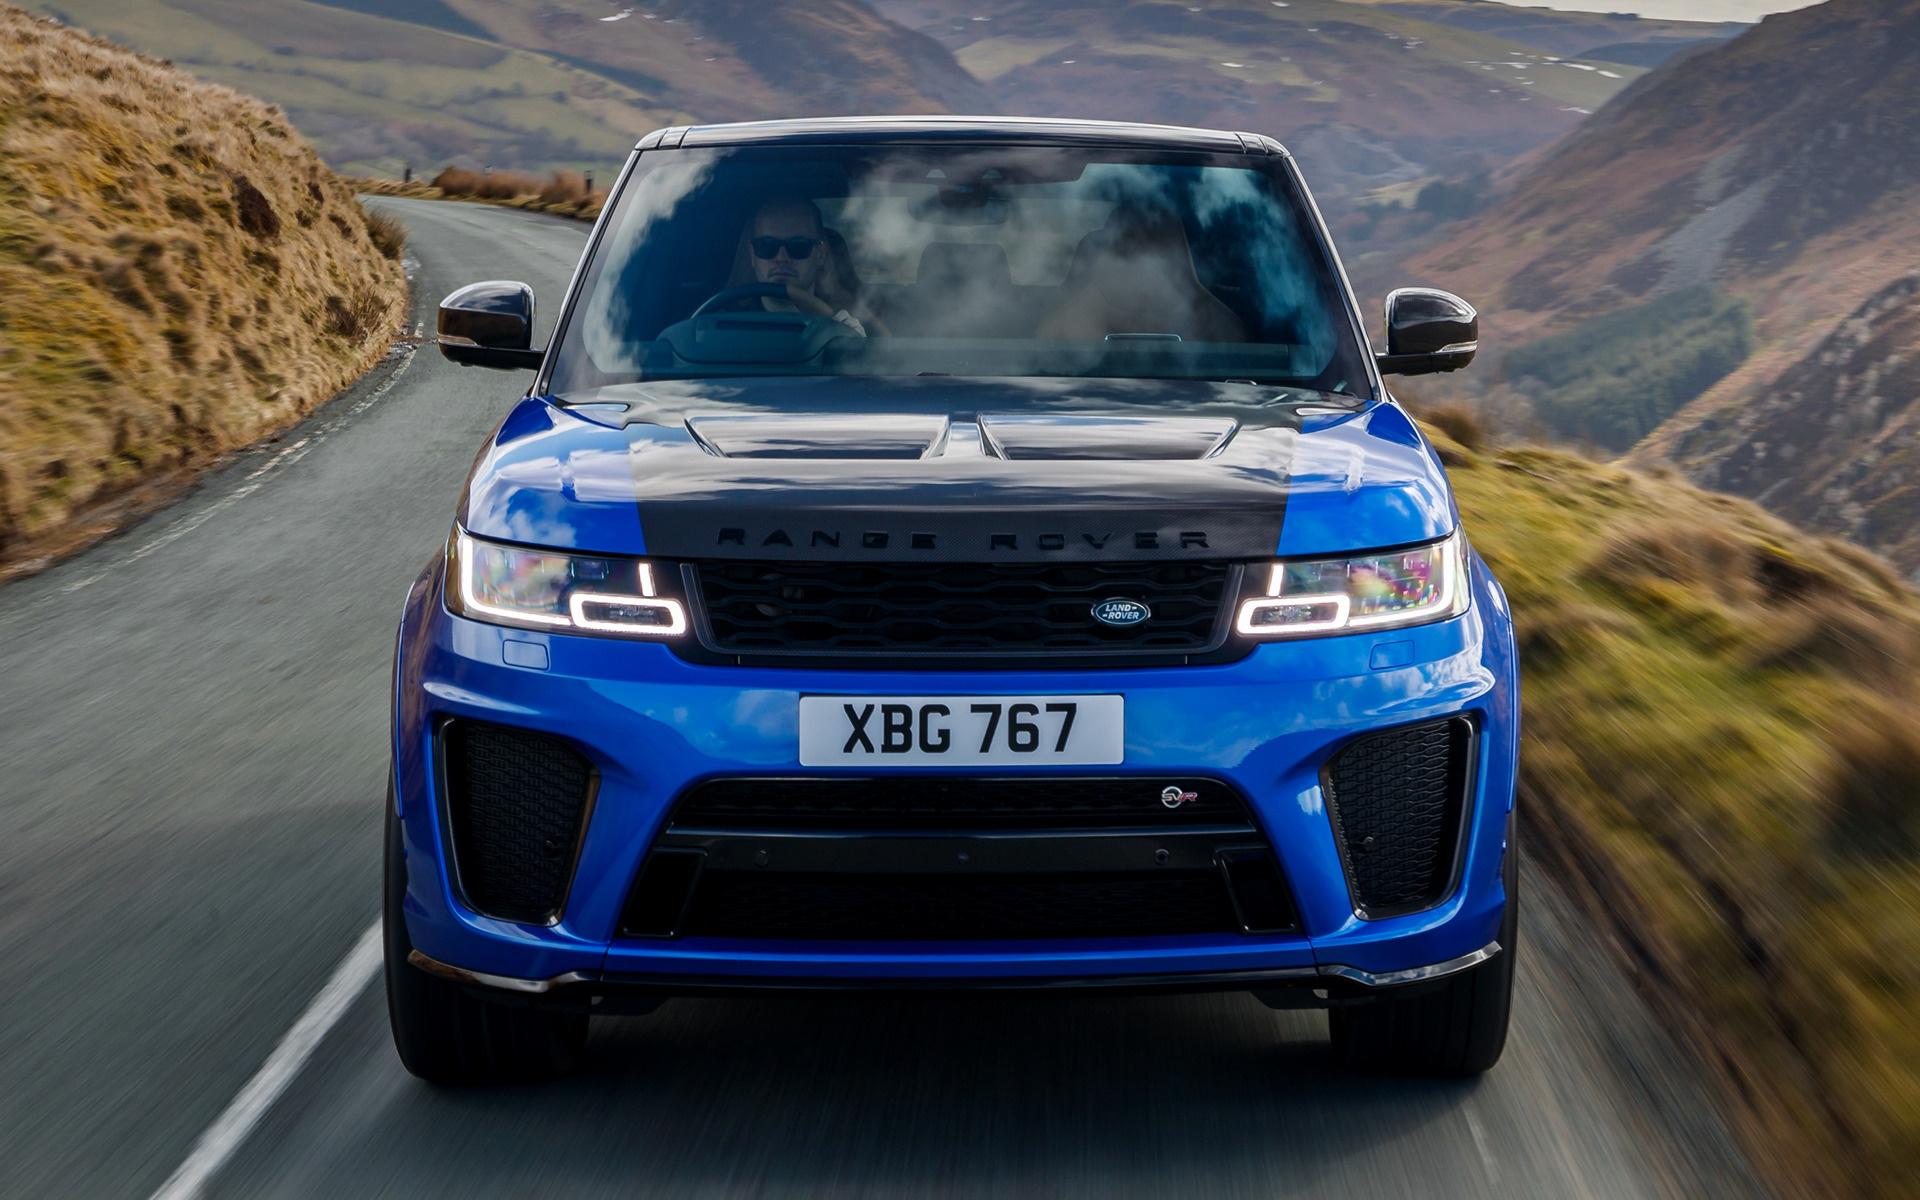 Lexus F Sport >> 2018 Range Rover Sport SVR (UK) - Wallpapers and HD Images | Car Pixel